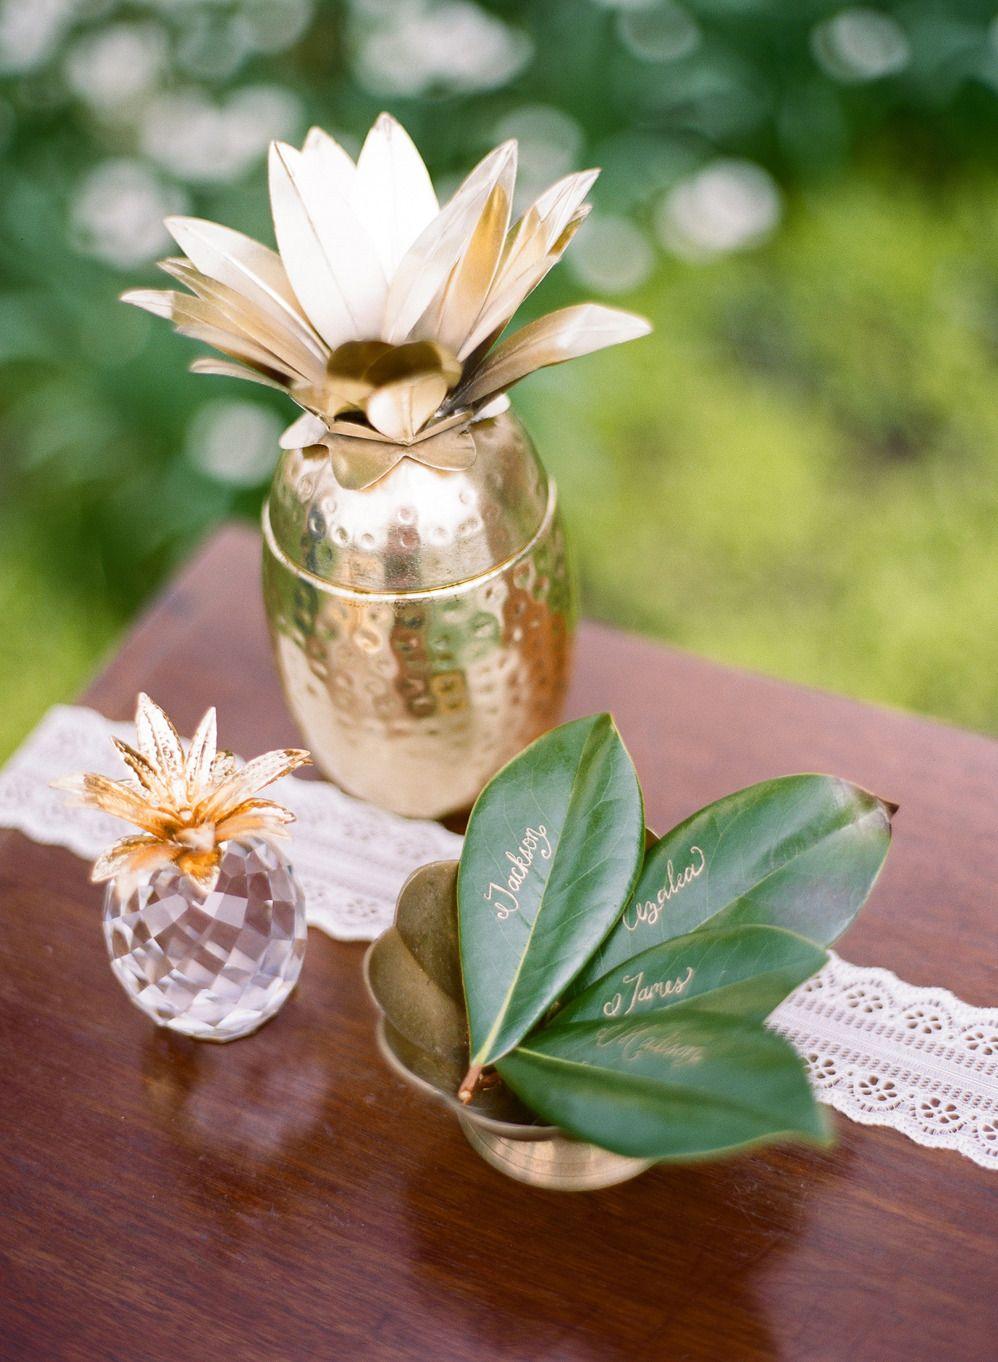 Photography: Audra Wrisley - audrawrisley.com